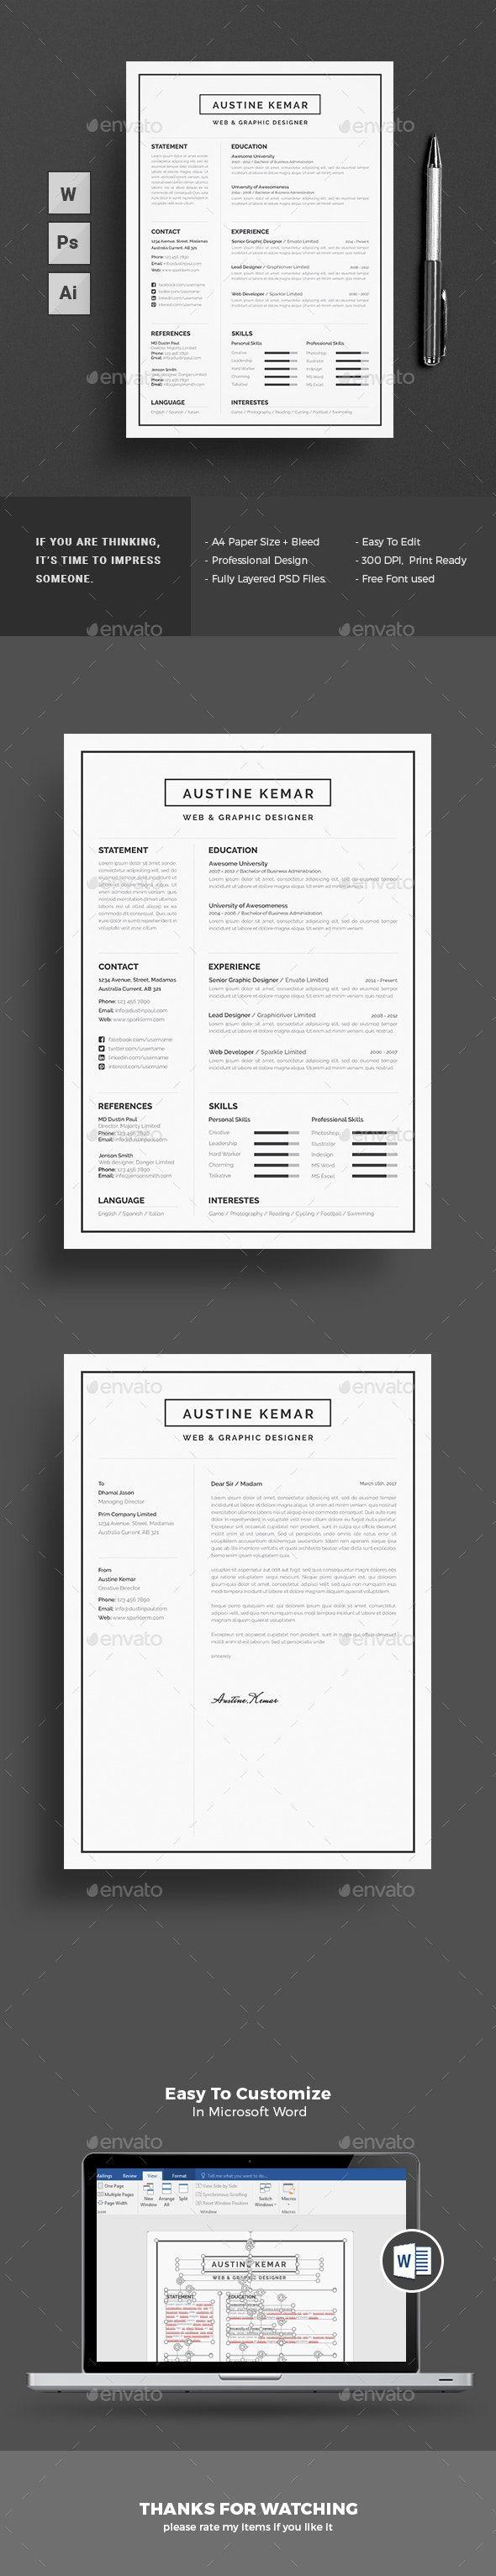 30 Resumes for Creative Fields ideas | resume design, resume tips, resume